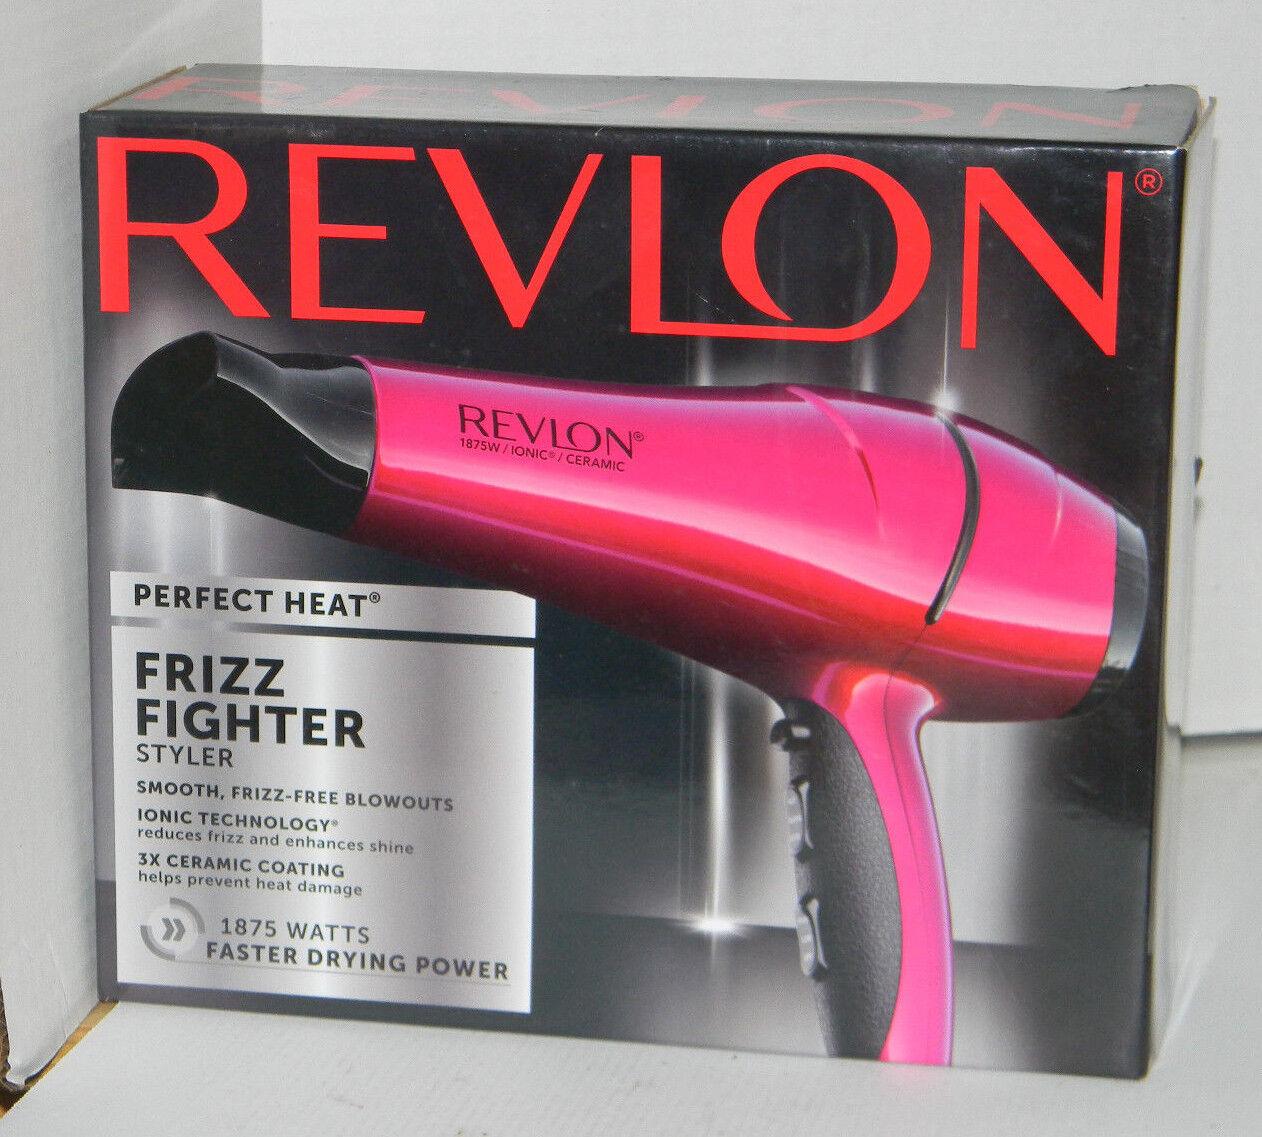 Revlon 1875W Frizz Fighter Hair Dryer